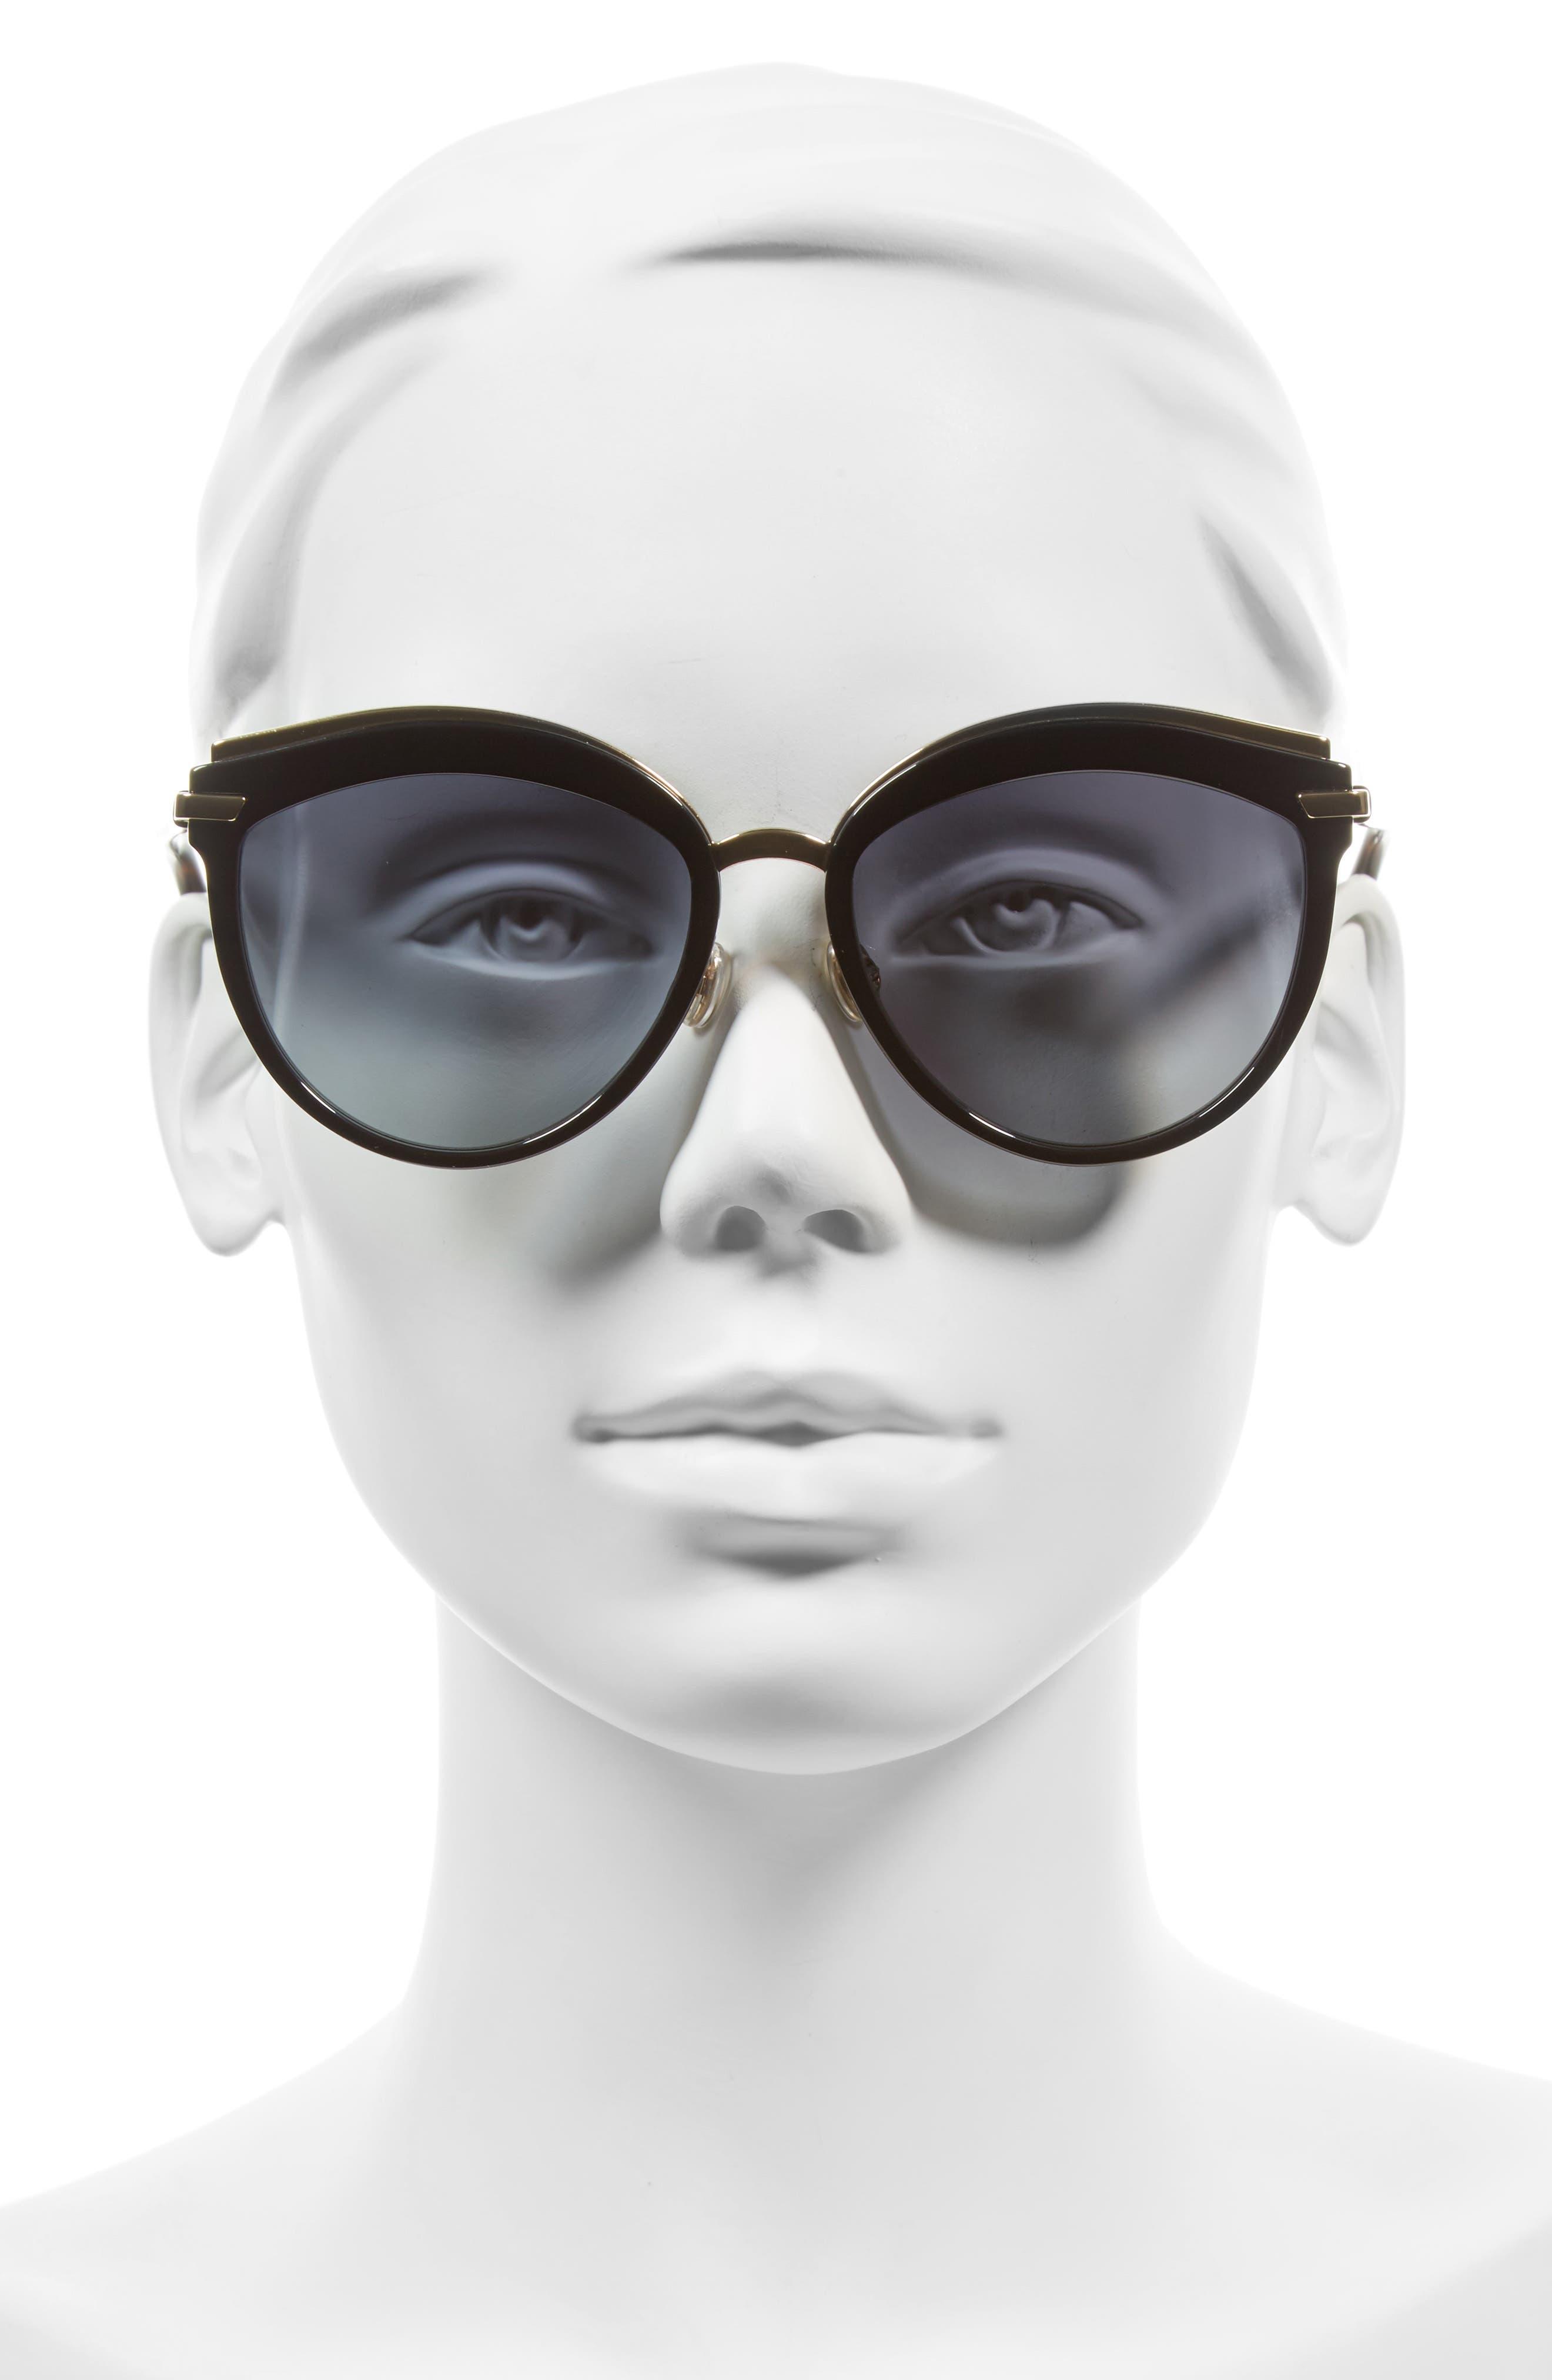 Offset 2 55mm Sunglasses,                             Alternate thumbnail 2, color,                             001